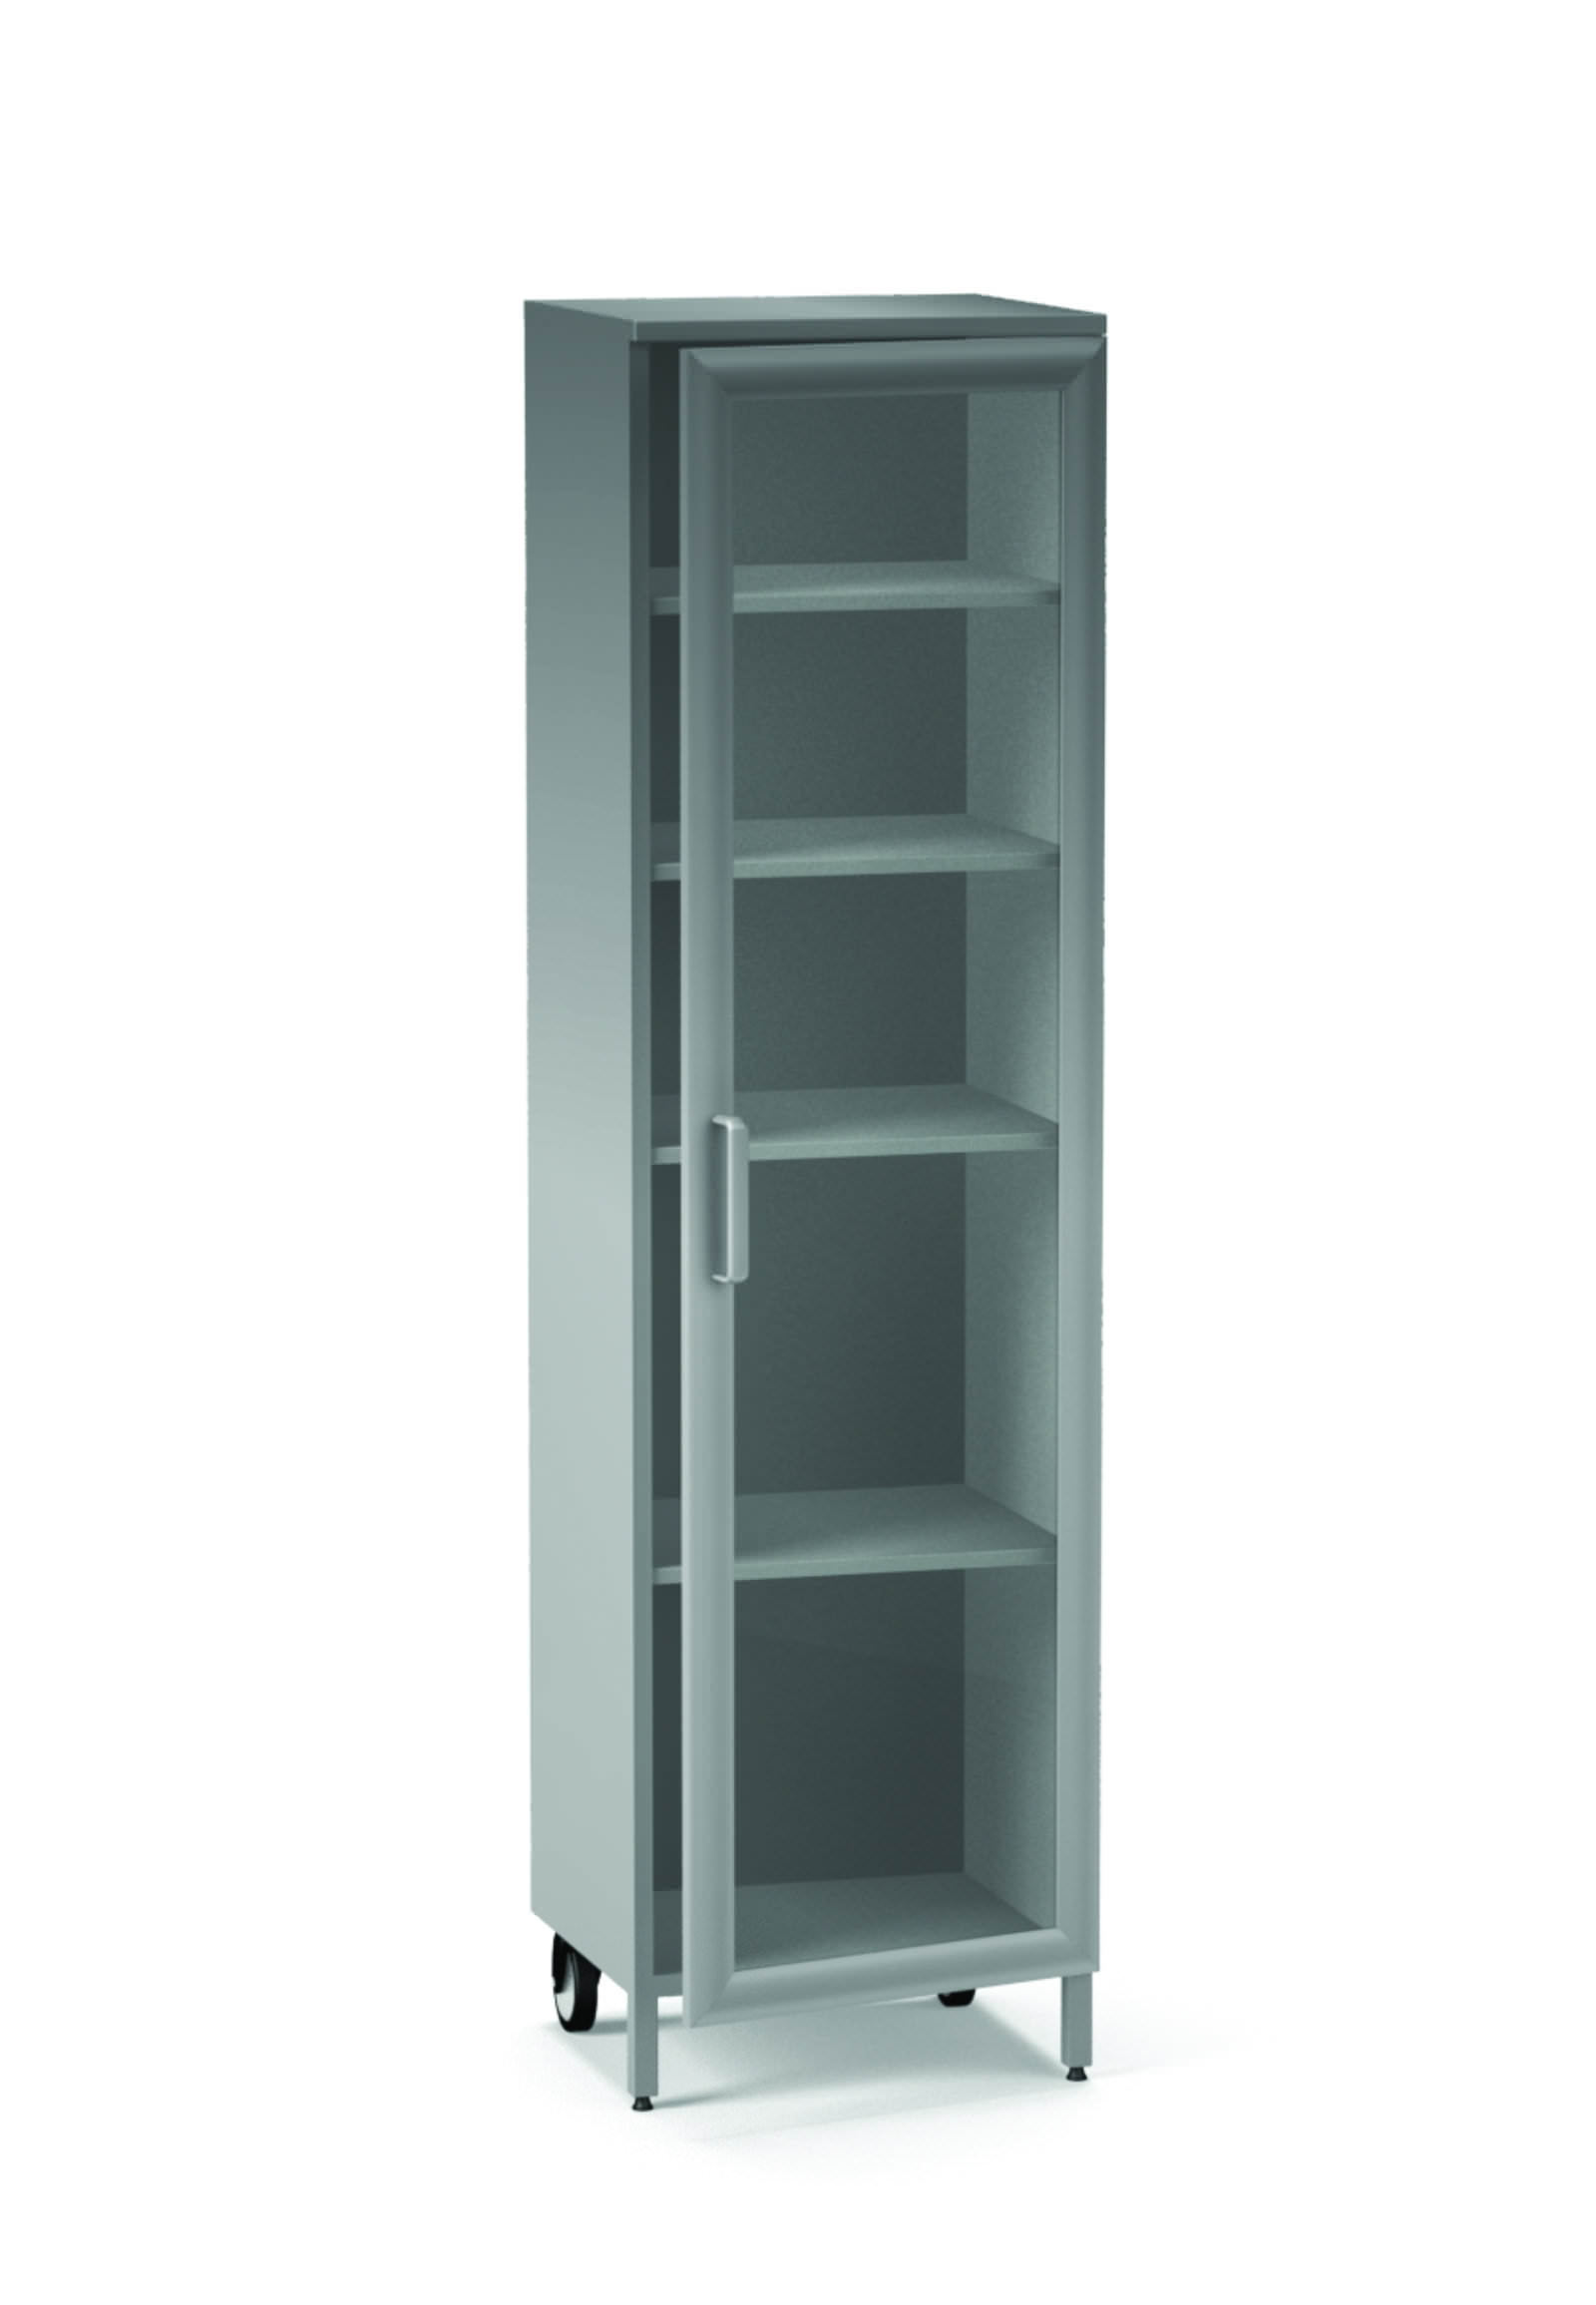 Шкаф медицинский ДМ-6-001-01